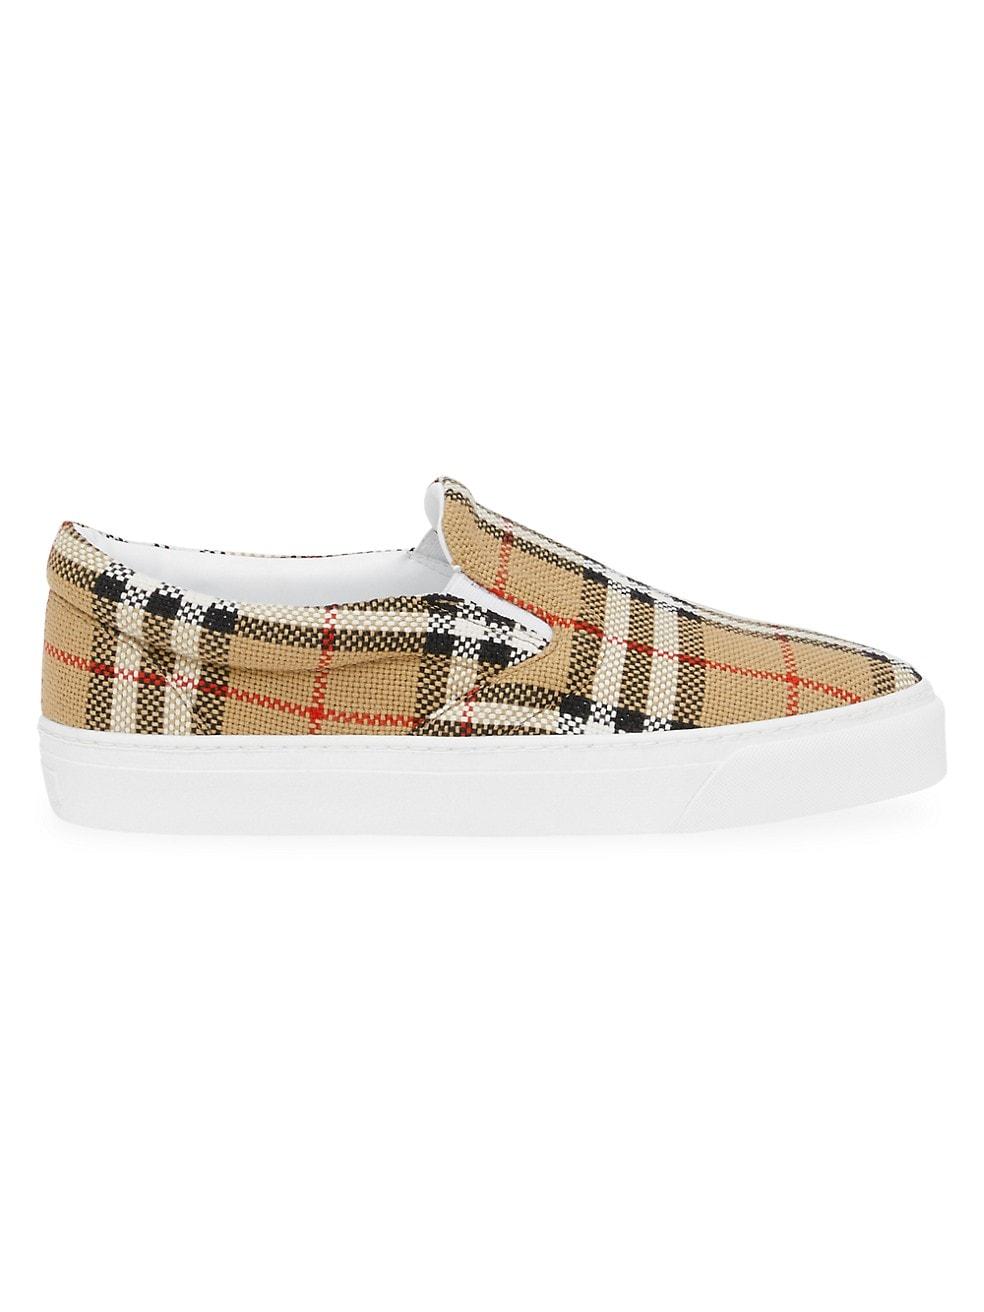 Burberry Thompson Canvas Slip-On Sneakers